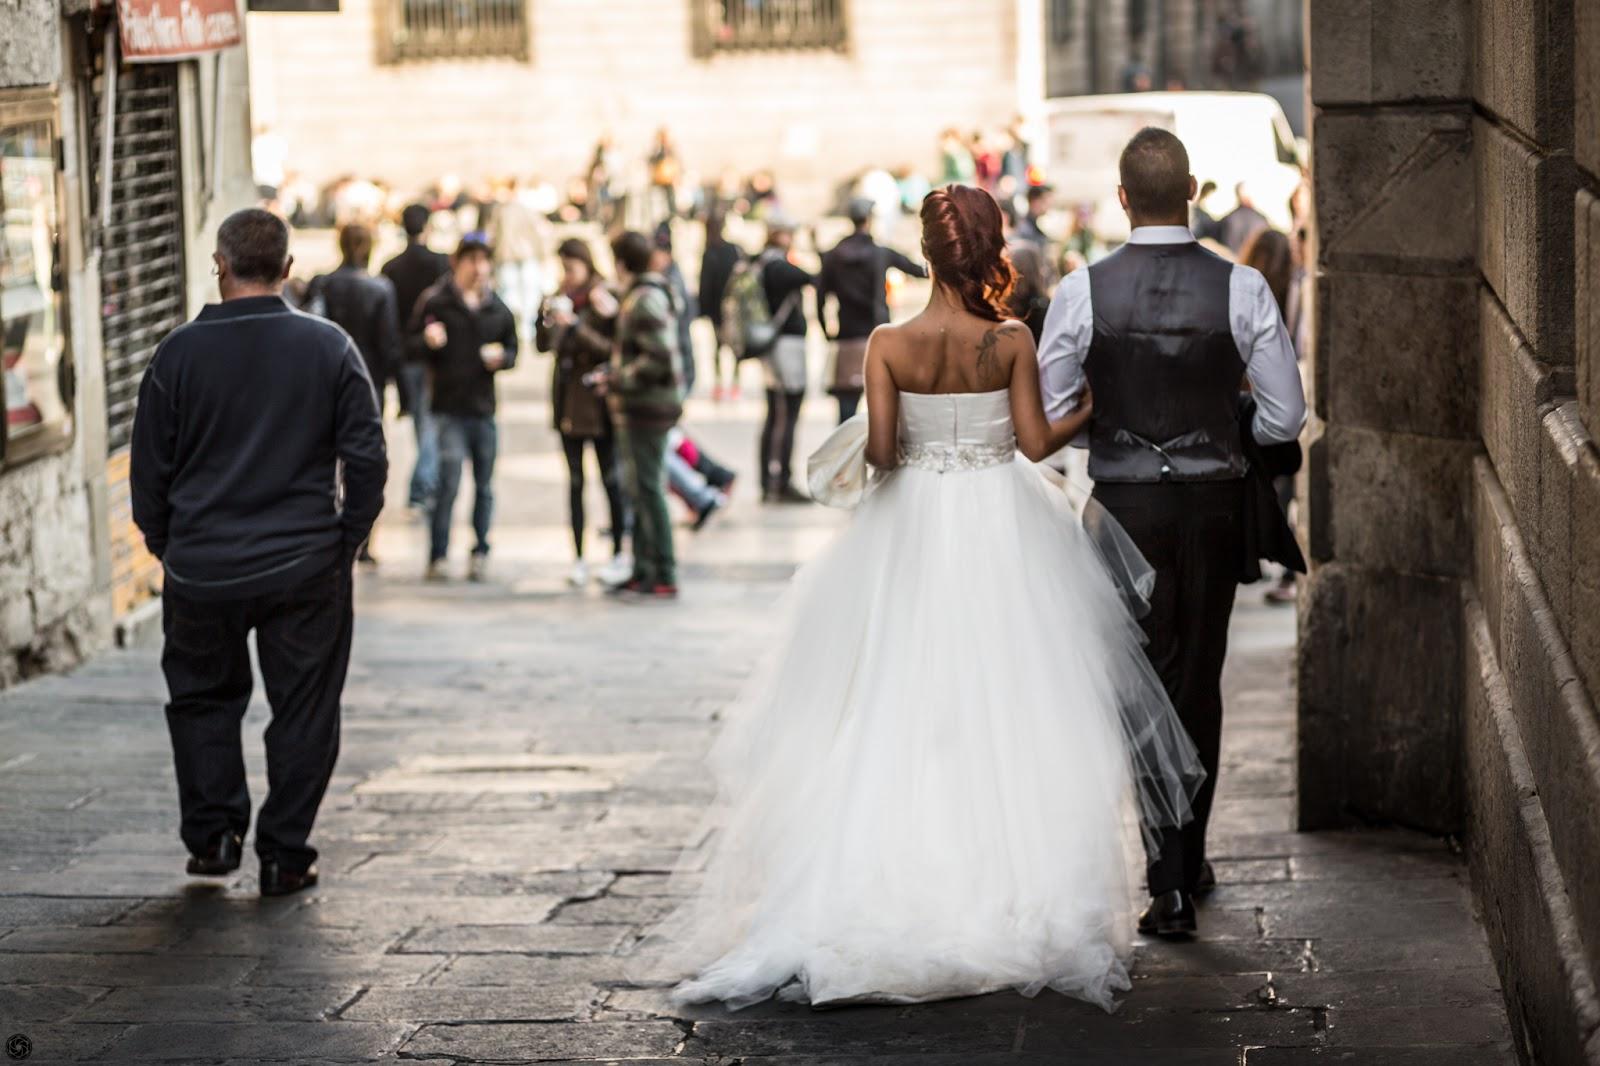 Solteros y casados :: Canon EOS 5D MkIII | ISO100 | Canon 85mm | f/2.5 | 1/250s